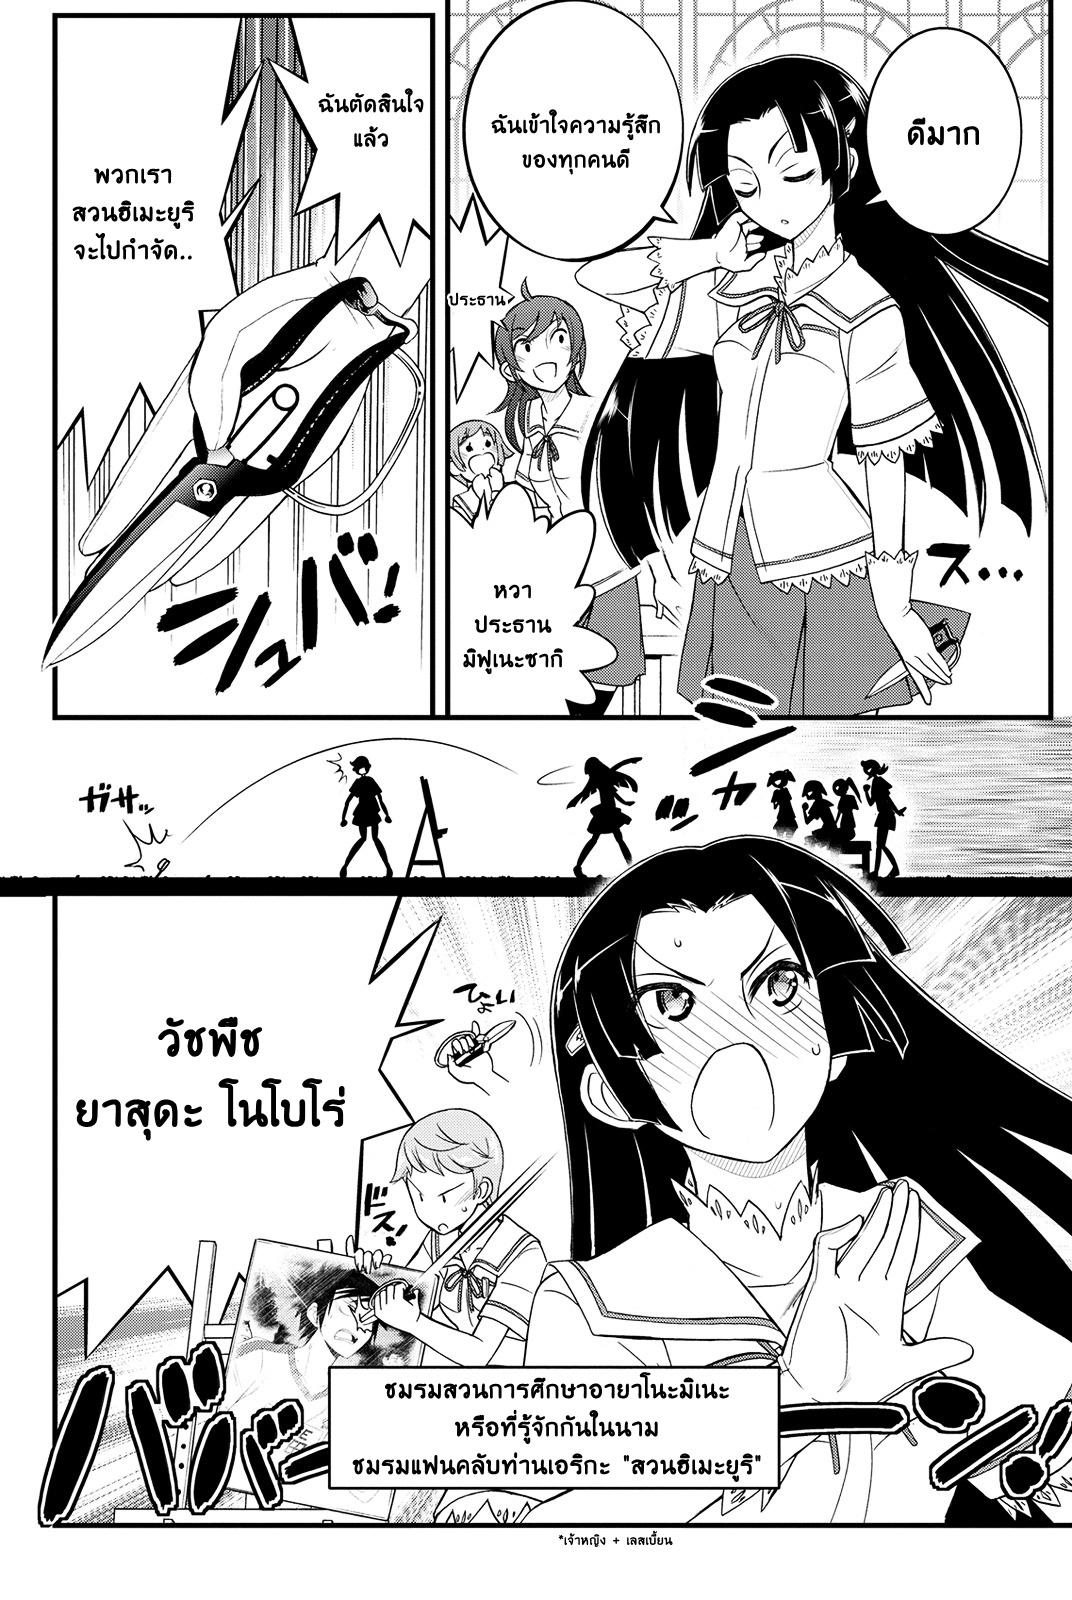 Kin no Kanojo Gin no Kanojo ตอนที่ 16 TH แปลไทย